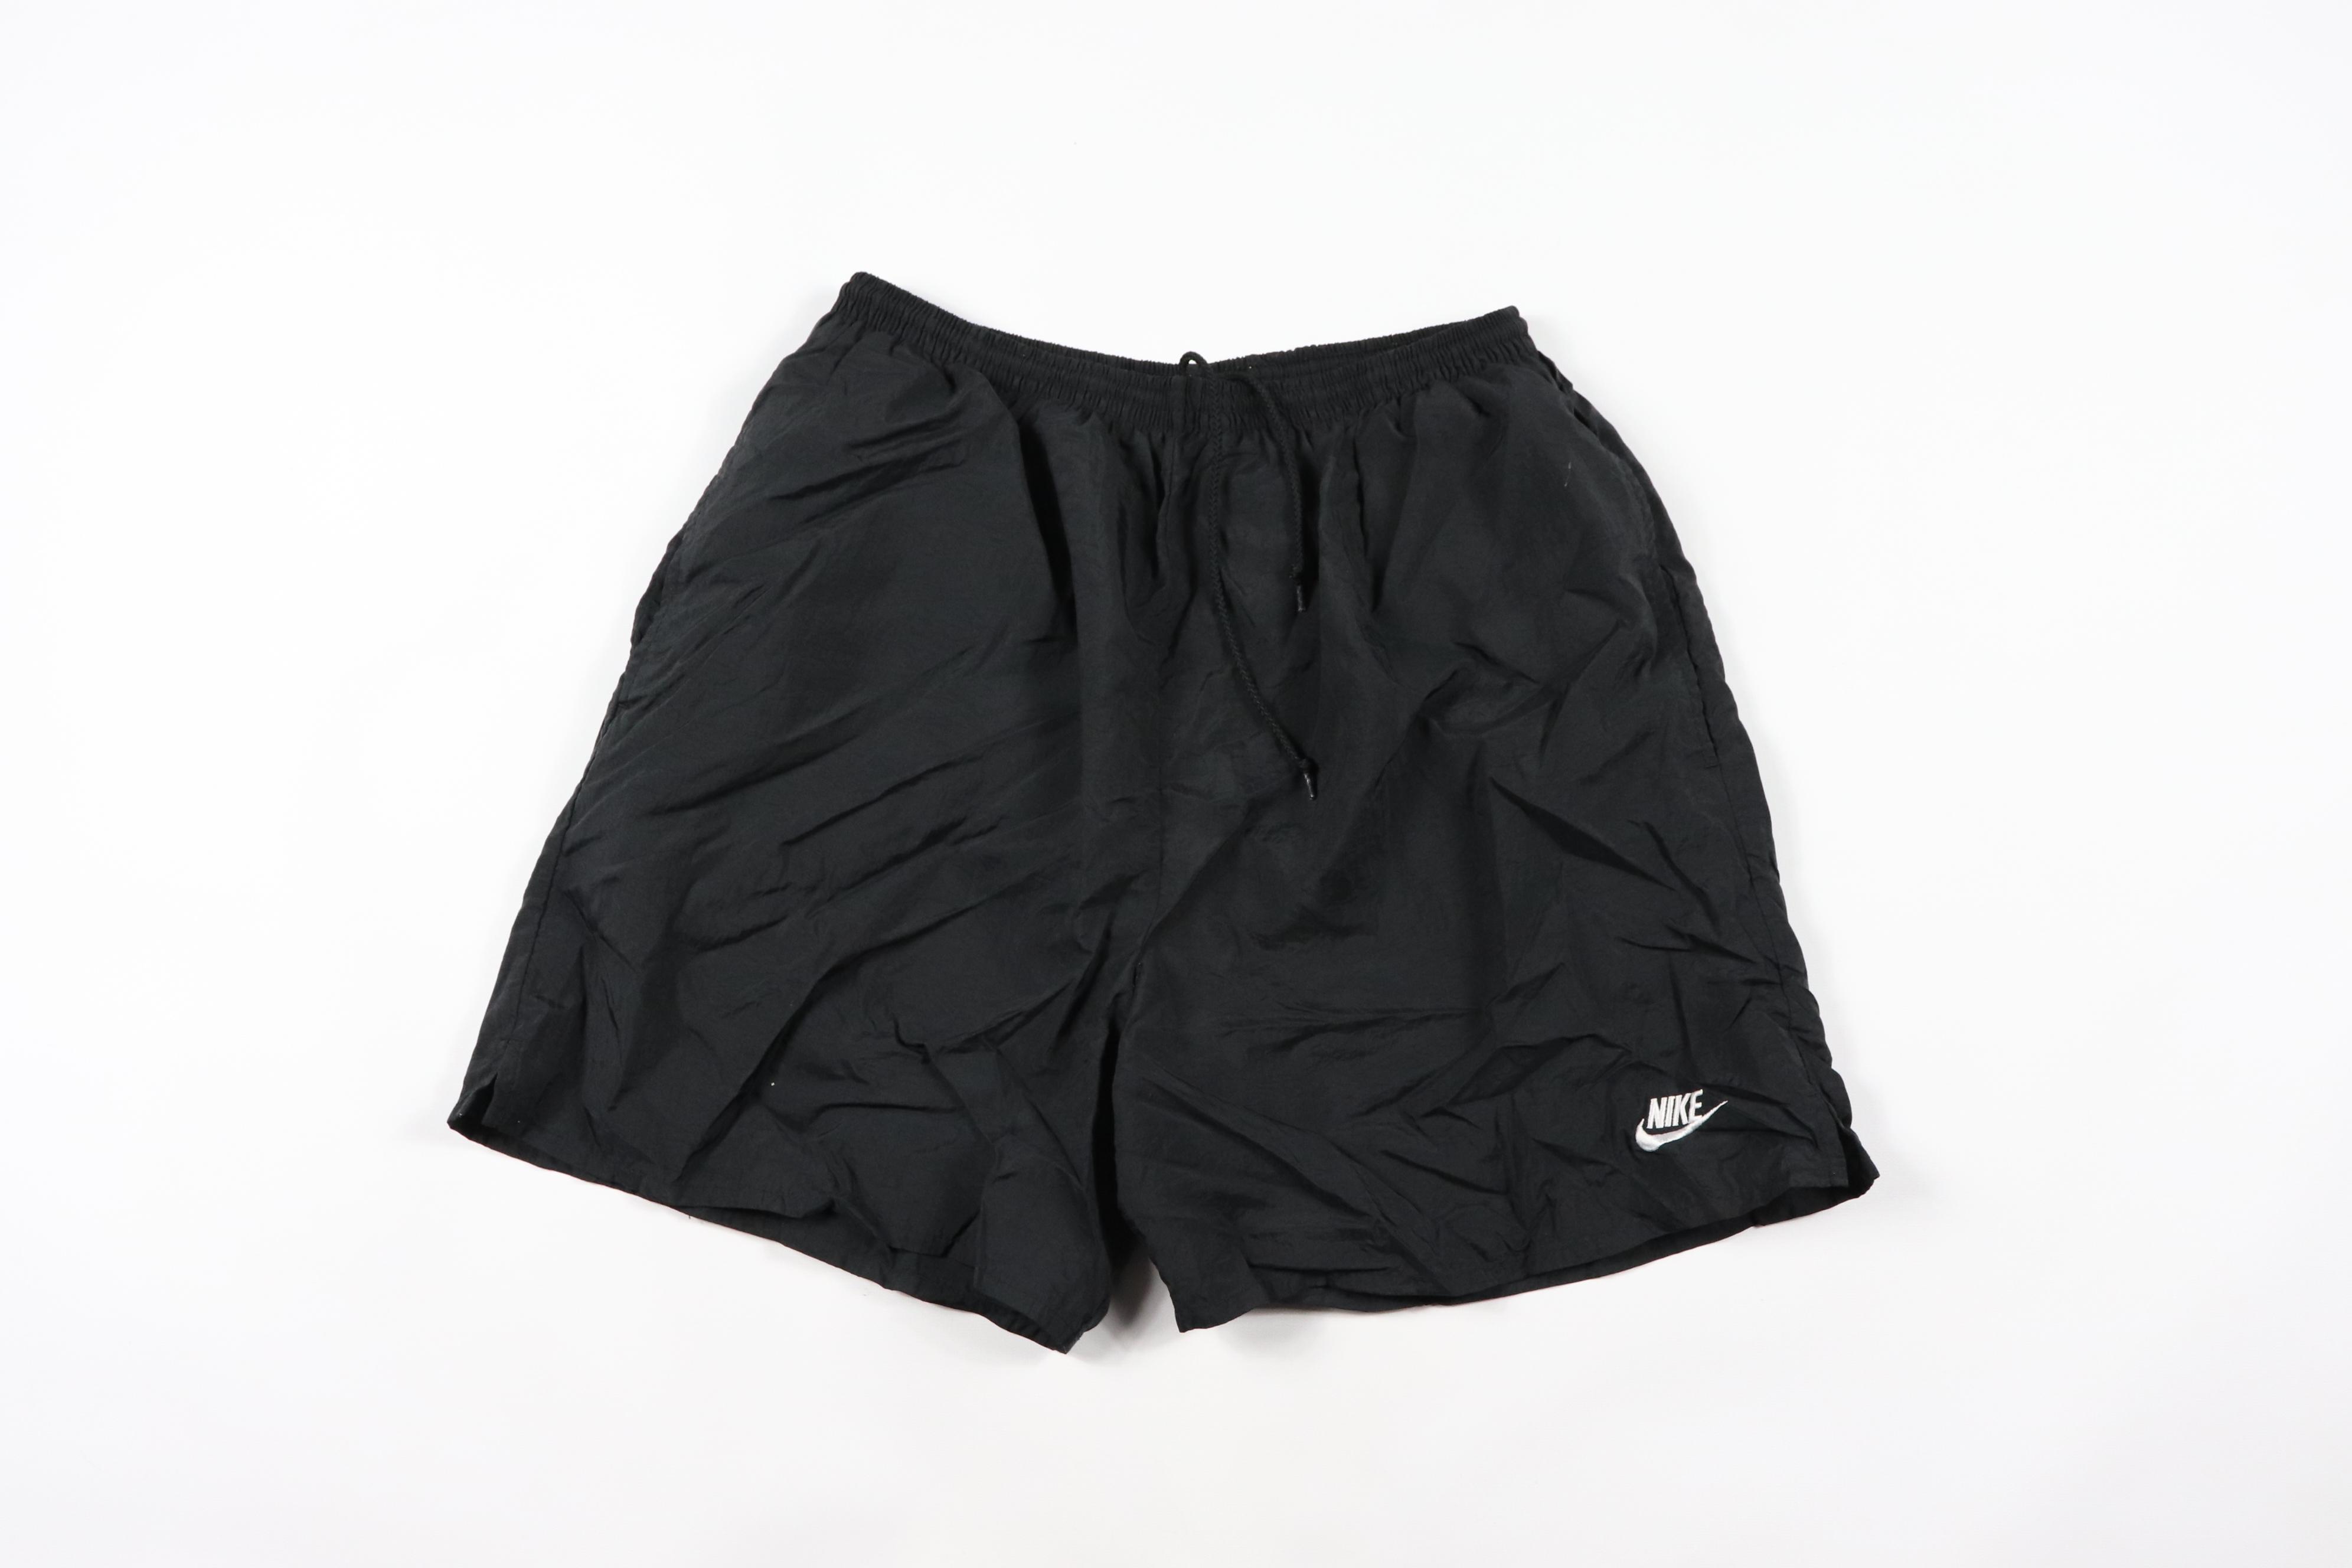 3928a575ee Nike × Vintage ×. Vintage 90s Nike Mens Large Spell Out Big Logo Nylon Swim  Trunks Shorts Black